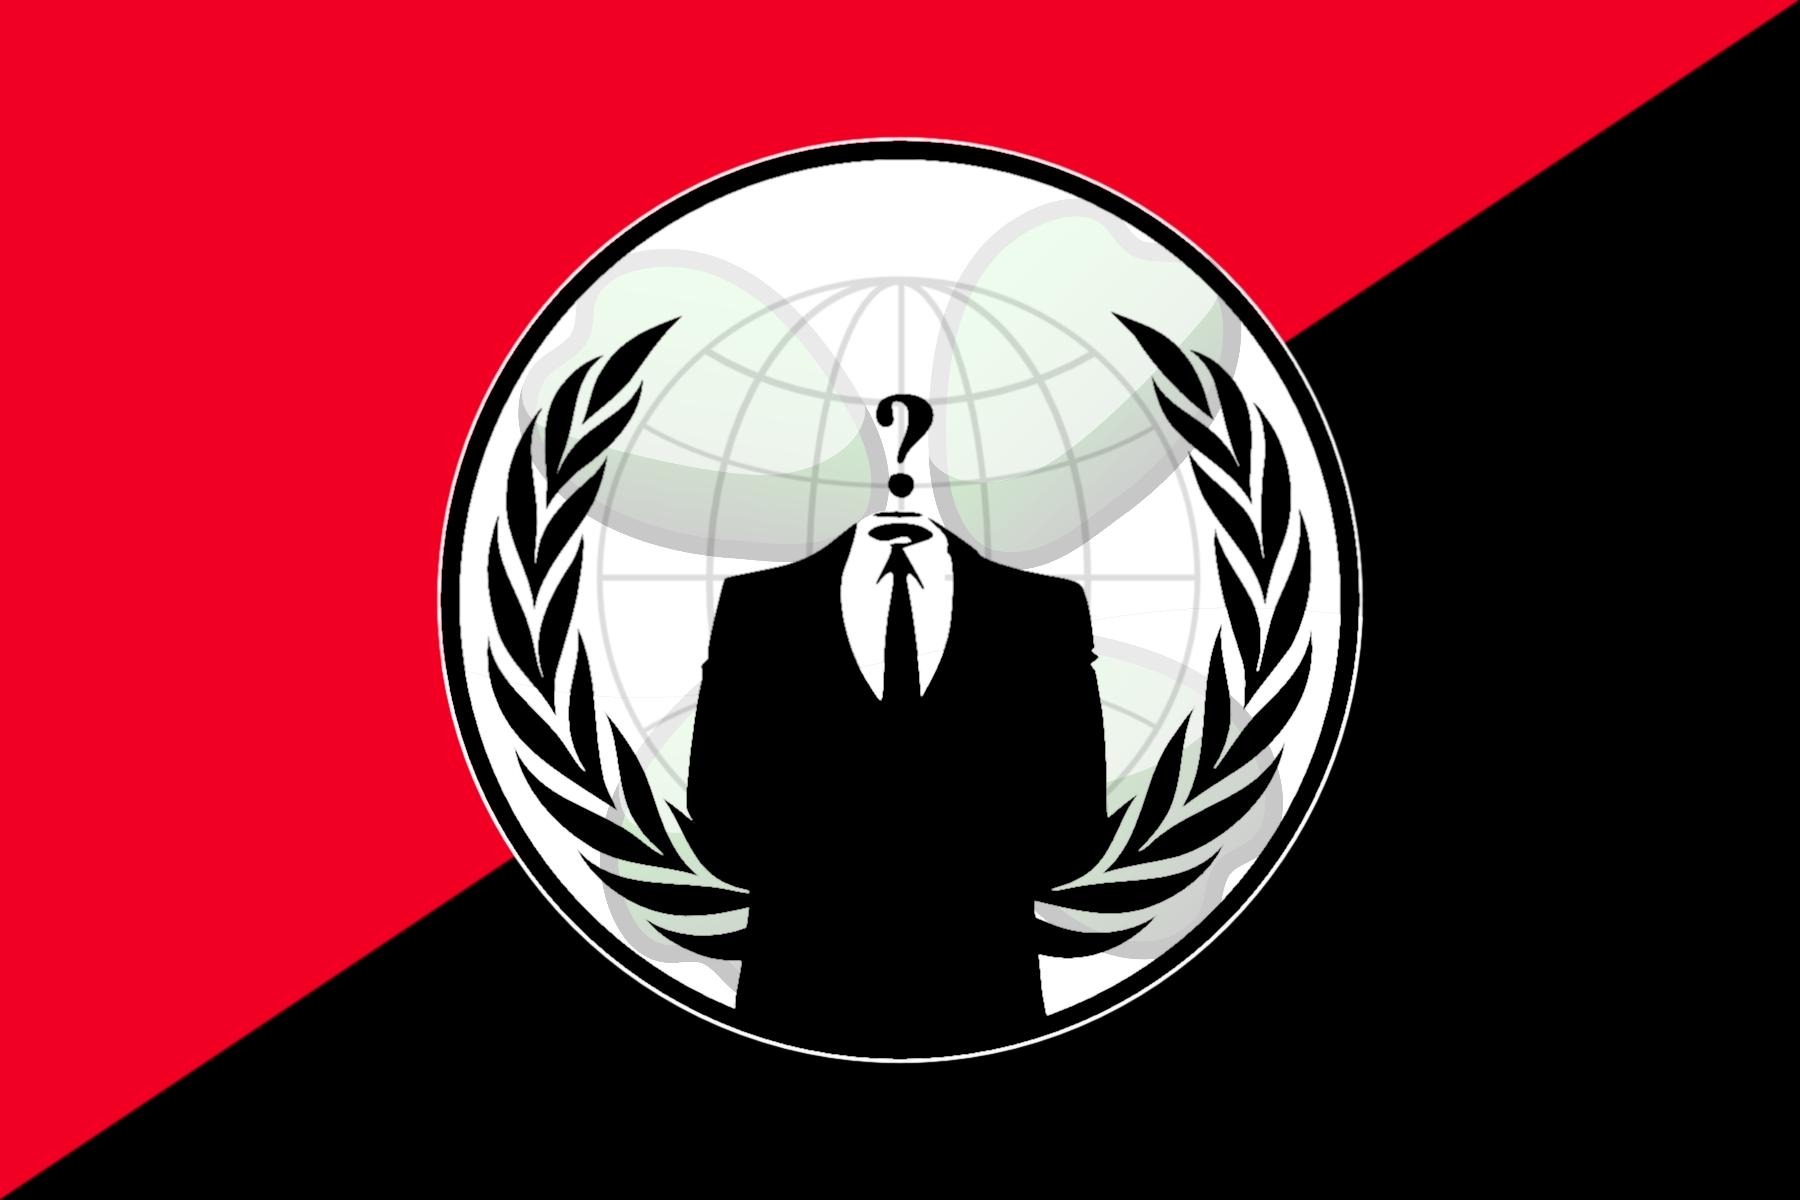 Image Anonymousg Roblox Creepypasta Wiki Fandom Powered By